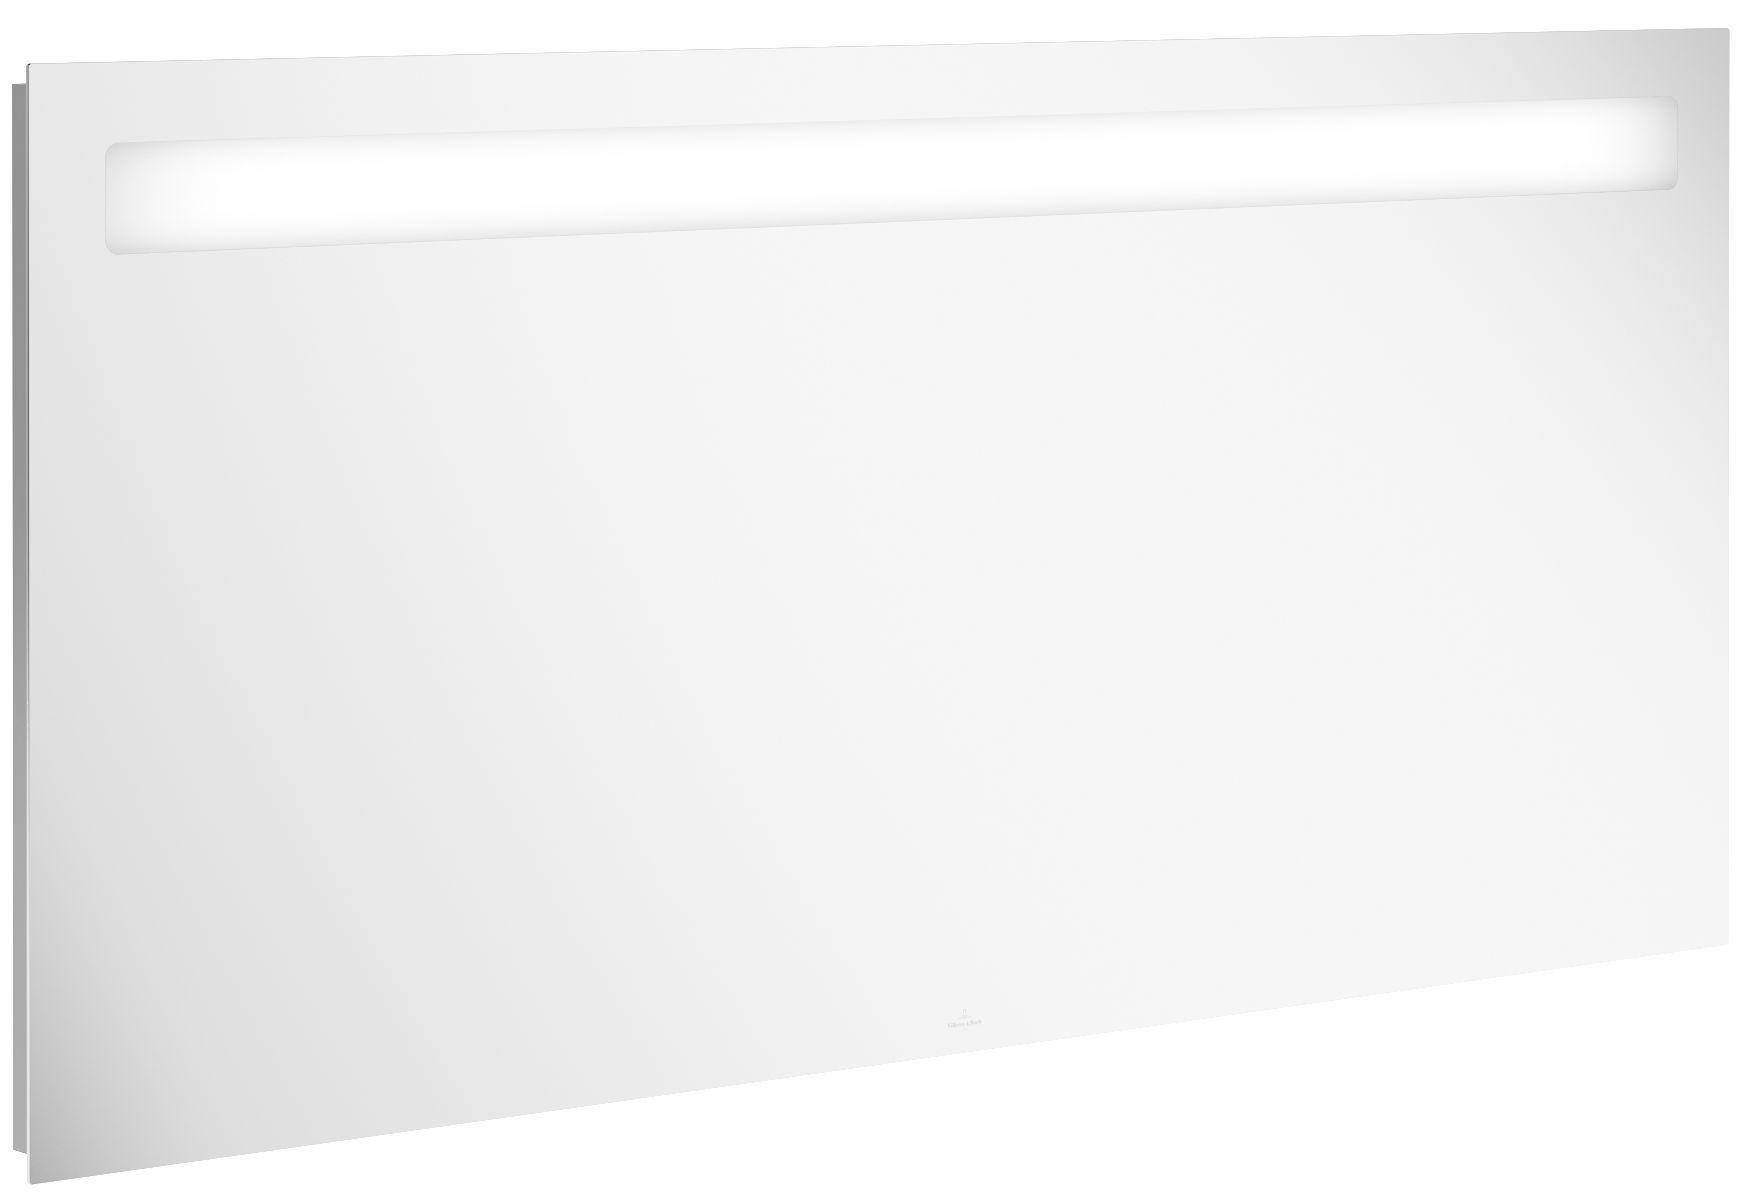 Villeroy & Boch More to See 14 Spiegel mit Beleuchtung  B:140xH:75xT:4,7cm A4321400